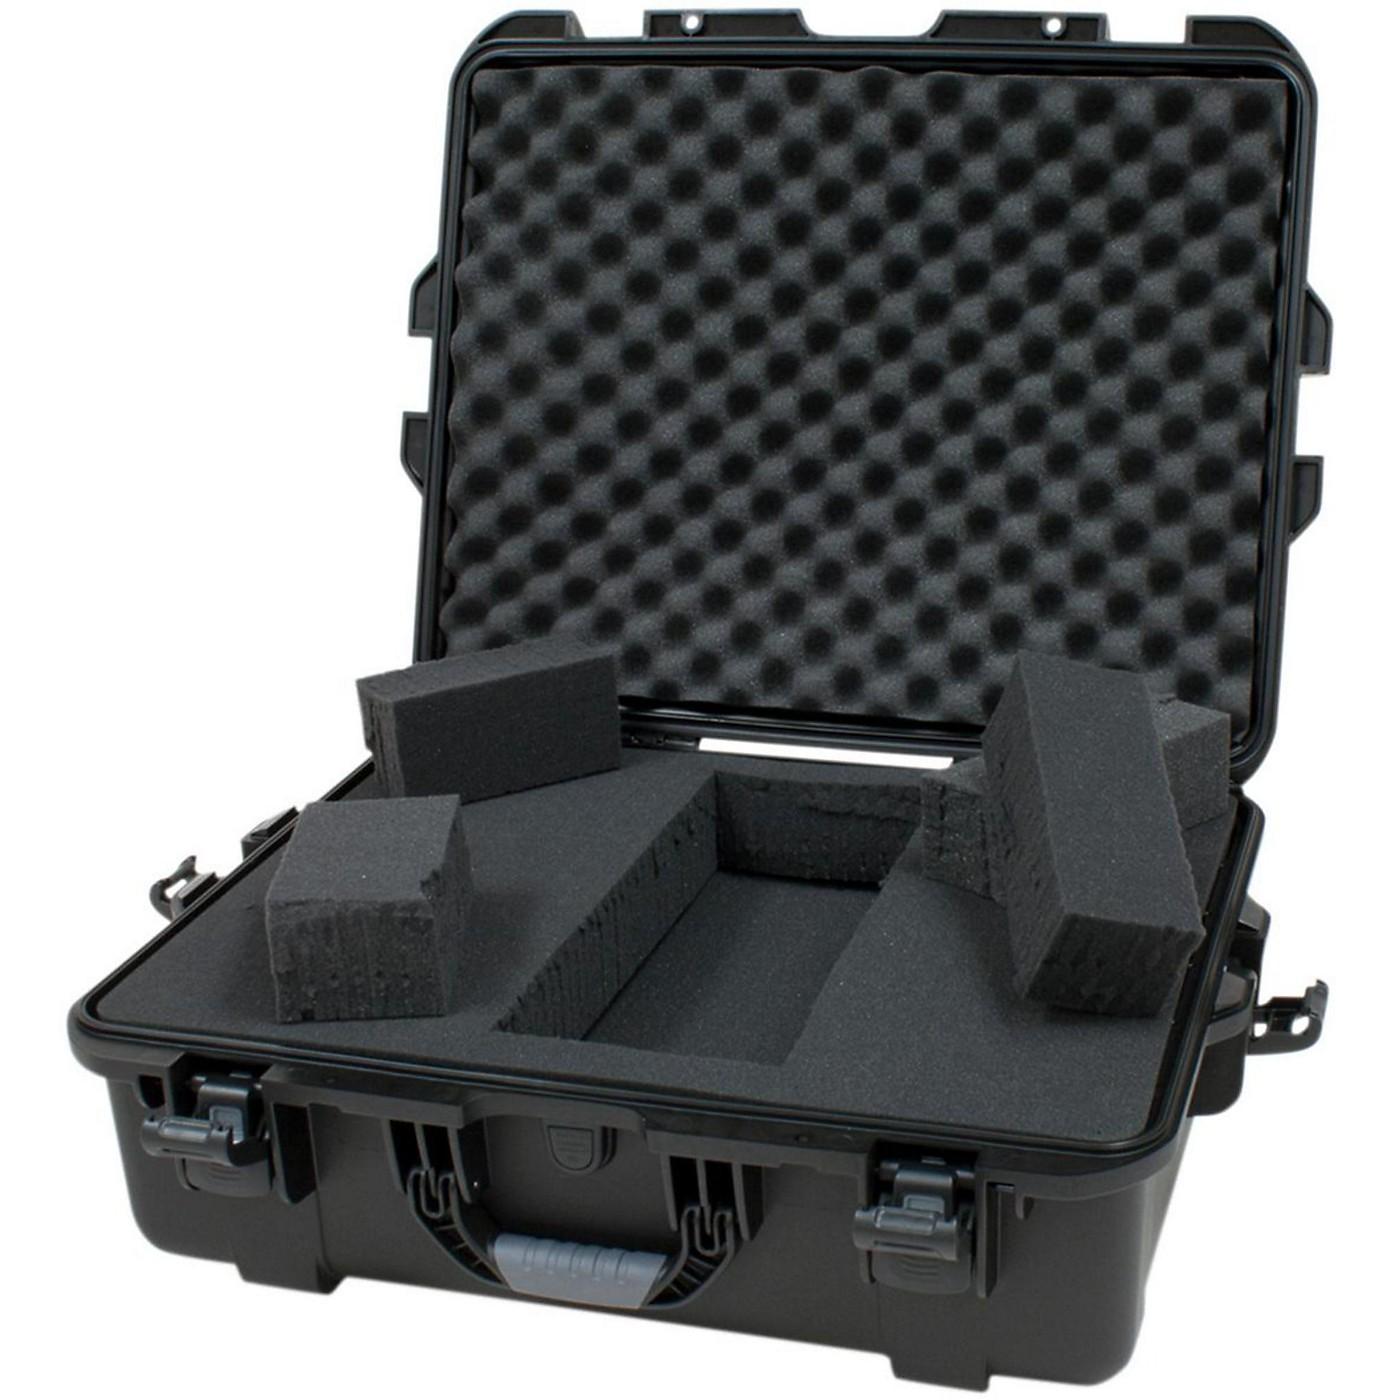 Gator GU-2217-08-WPDF Waterproof Injection Molded Case thumbnail